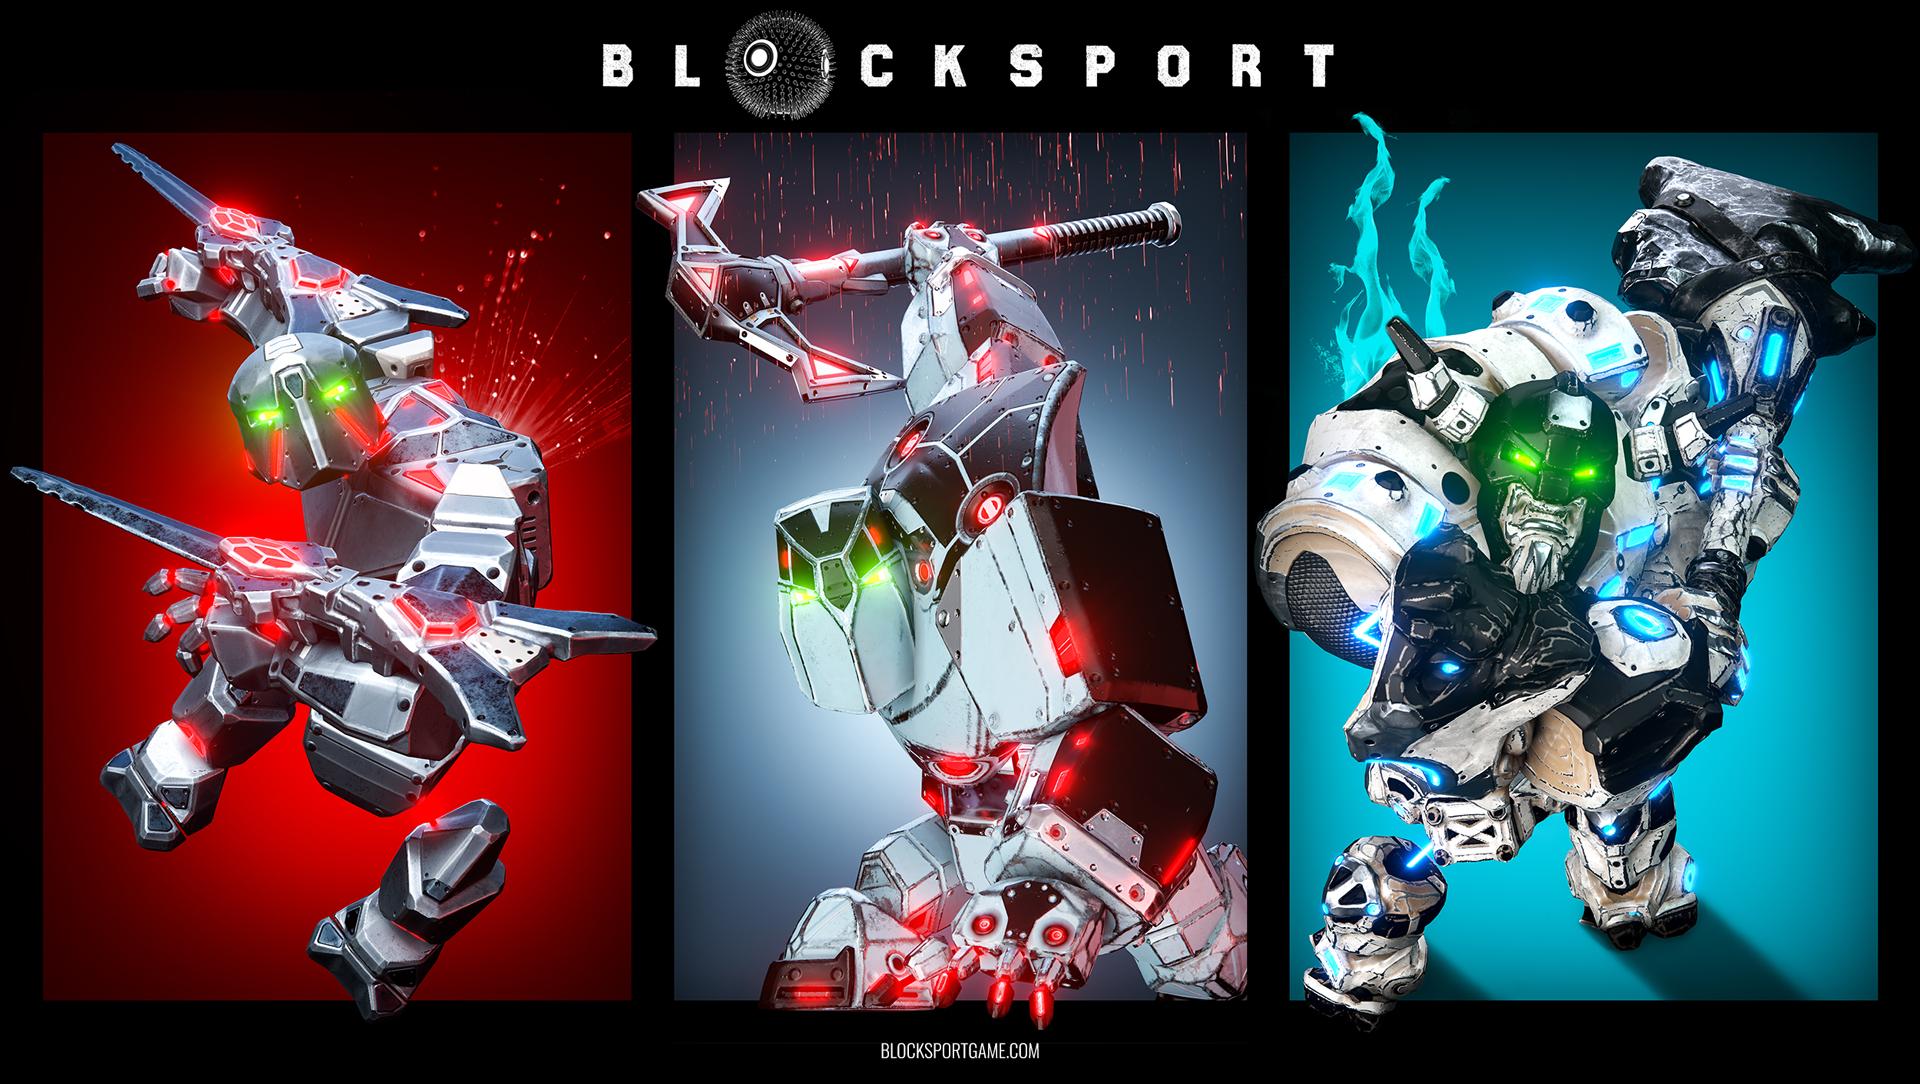 BlockSport 3Hero Poster 1920